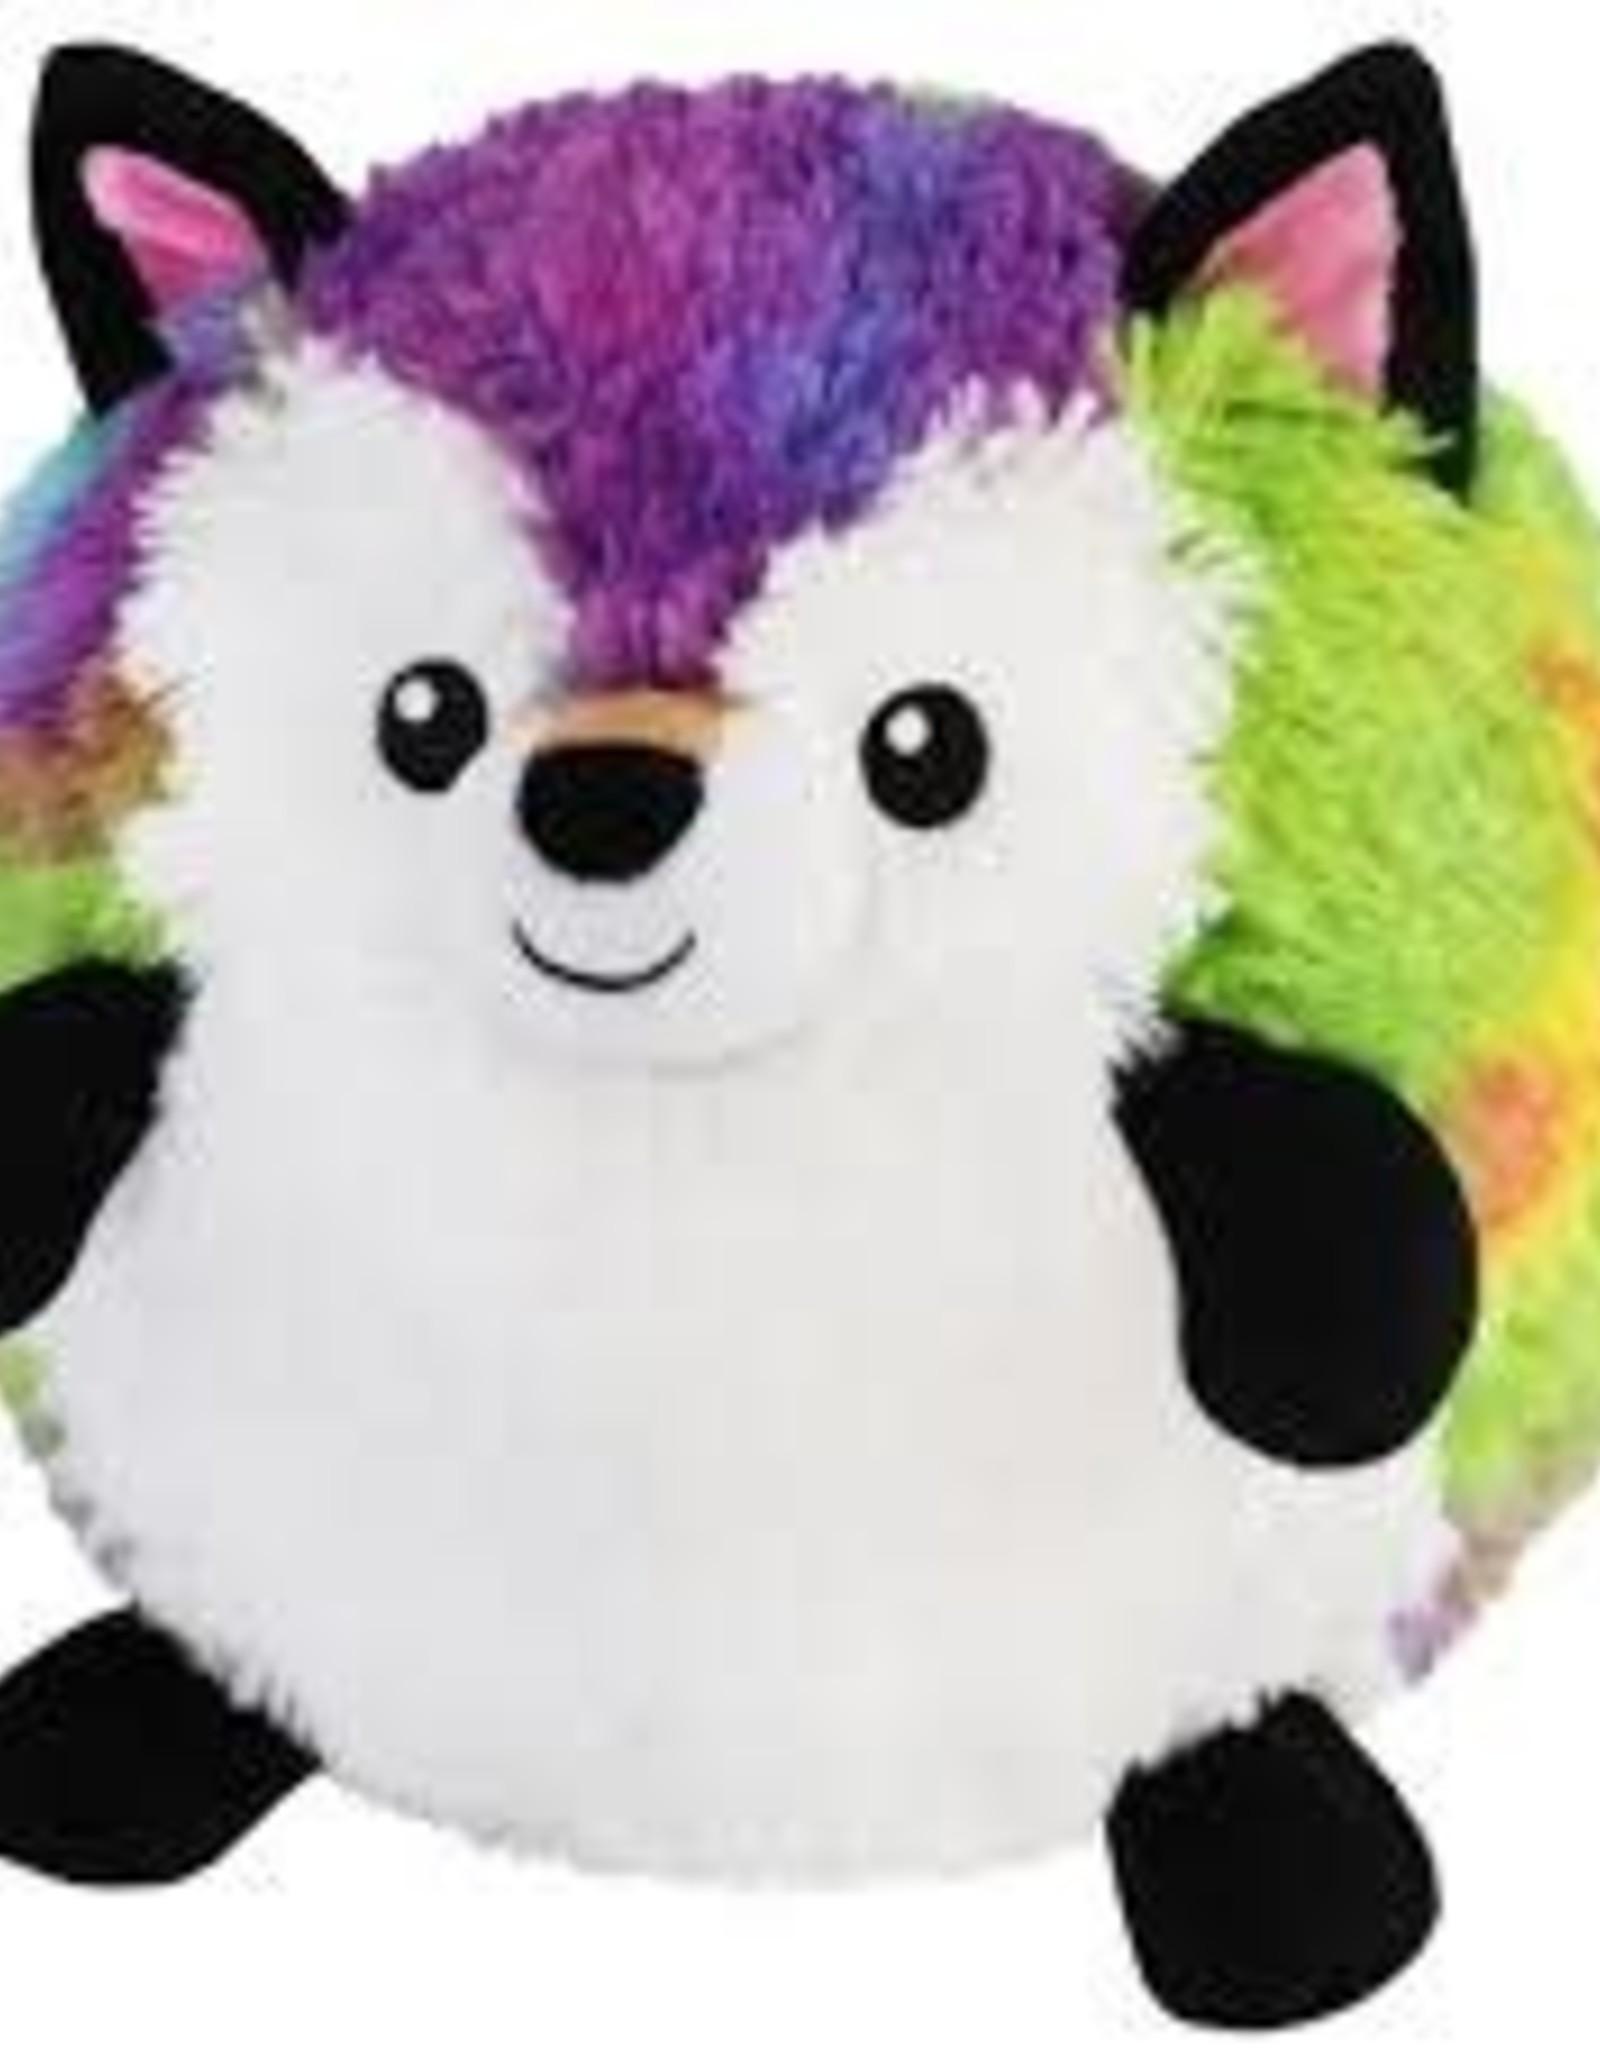 Squishable Mini Squishable Prism Baby Fox